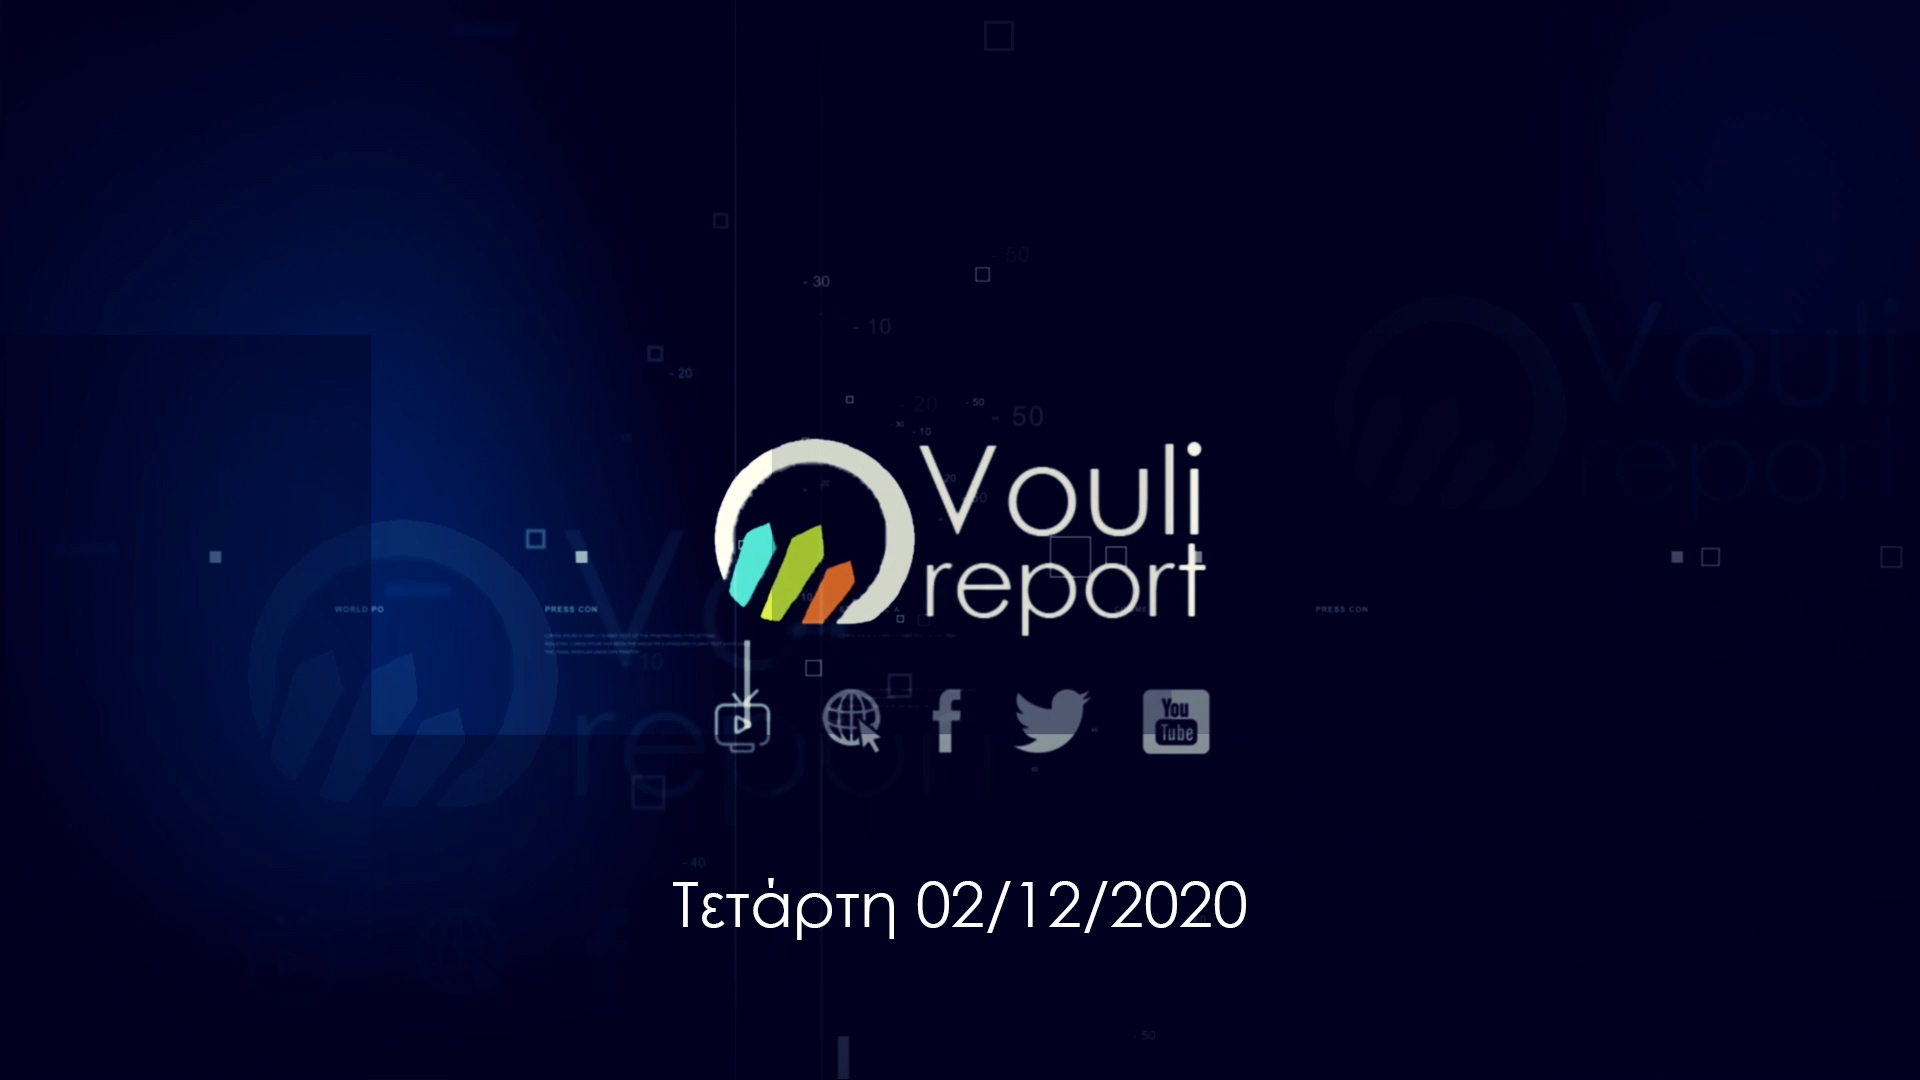 Vouli report   02/12/2020